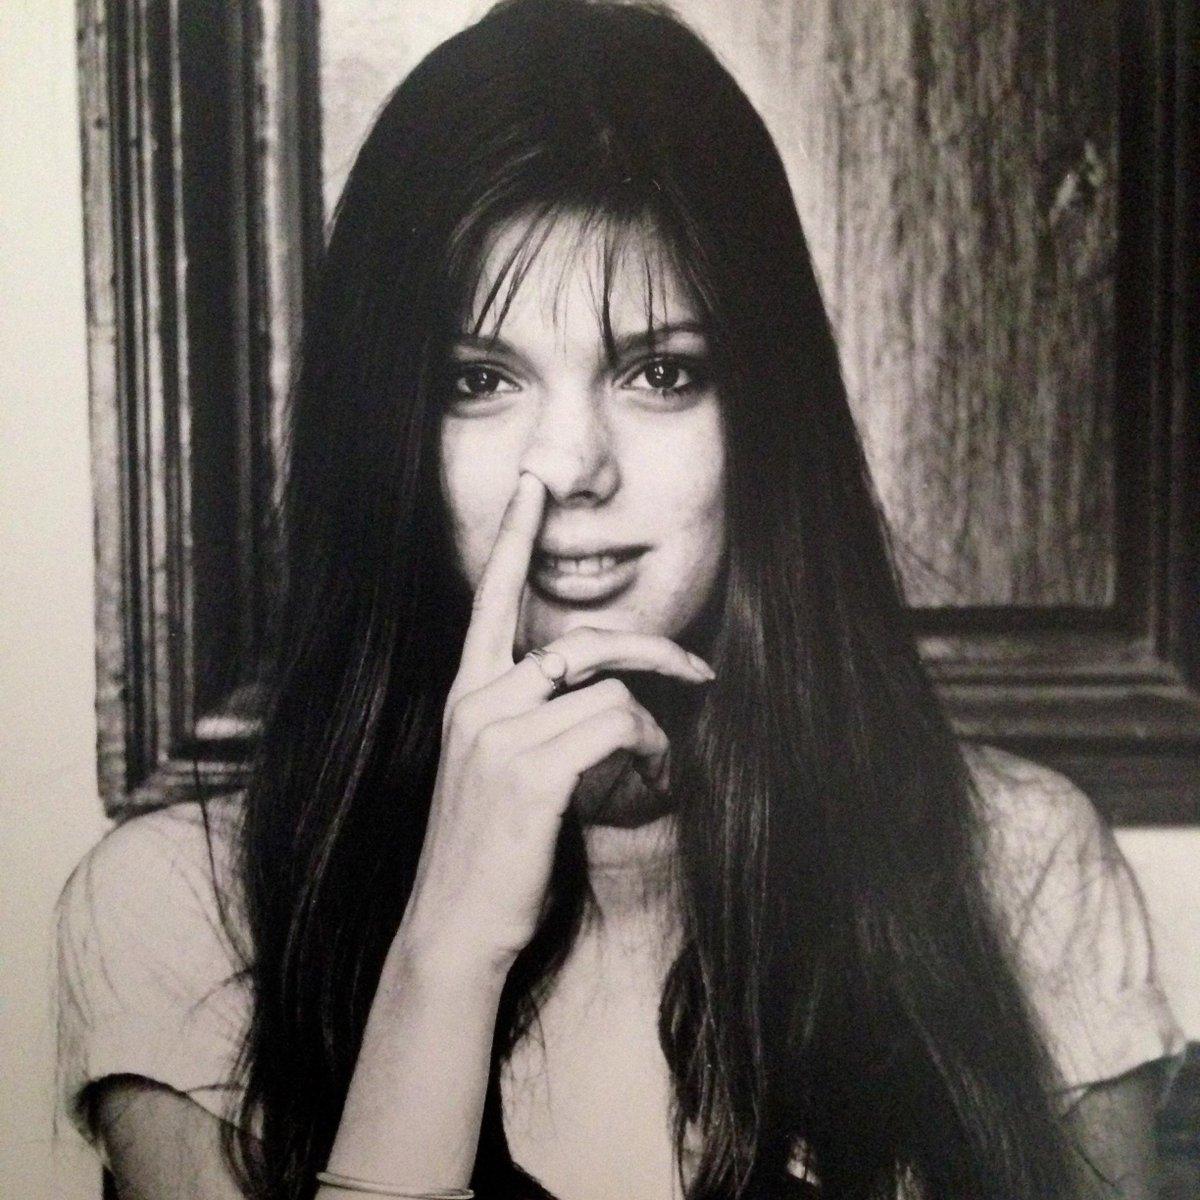 Eleonore Klarwein